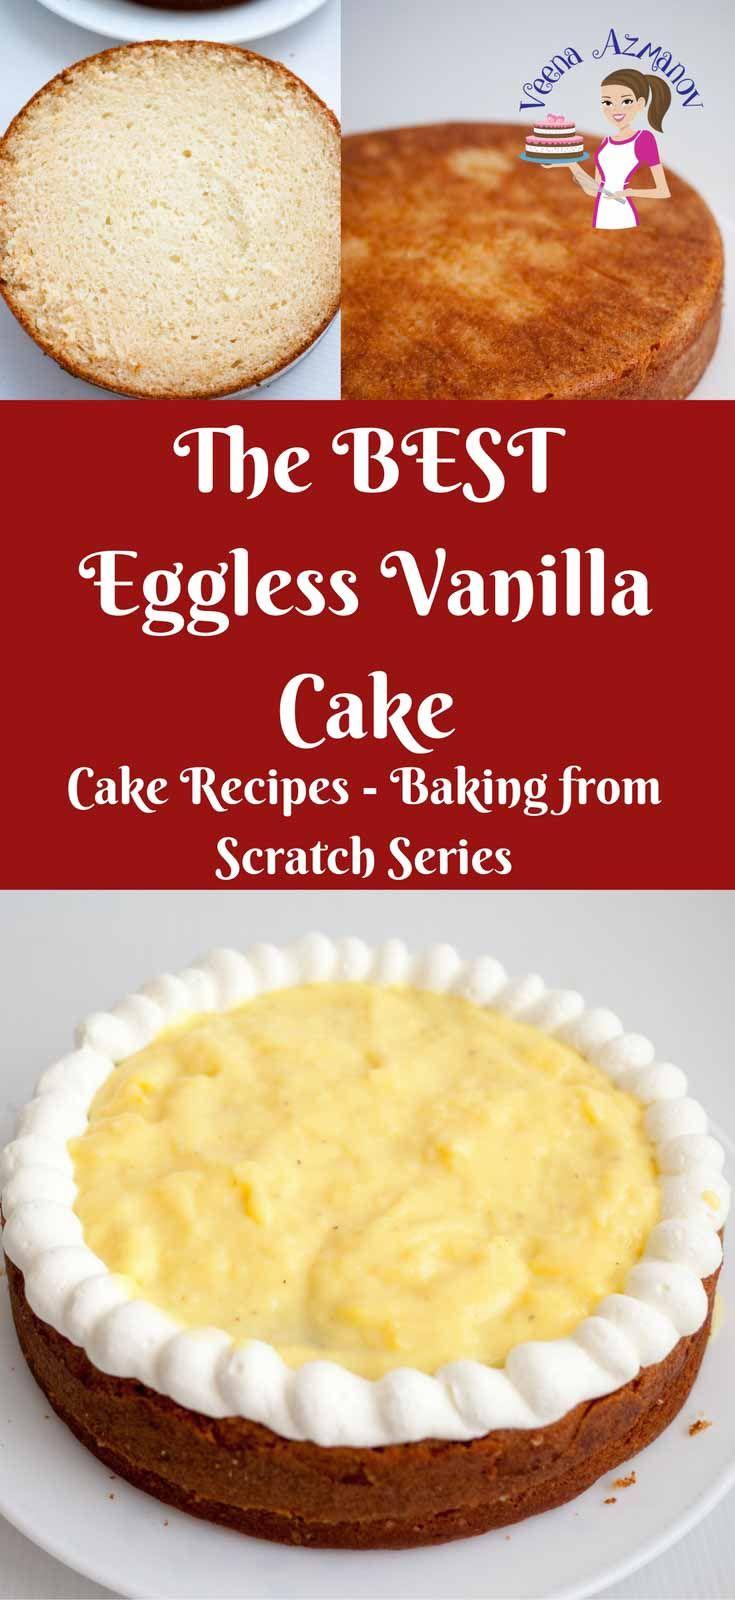 The Best Eggless Vanilla Cake Recipe This Best Eggless Vanilla Cake Is Moist With A Firm Texture Eggless Vanilla Cake Recipe Vanilla Cake Recipe Cake Recipes